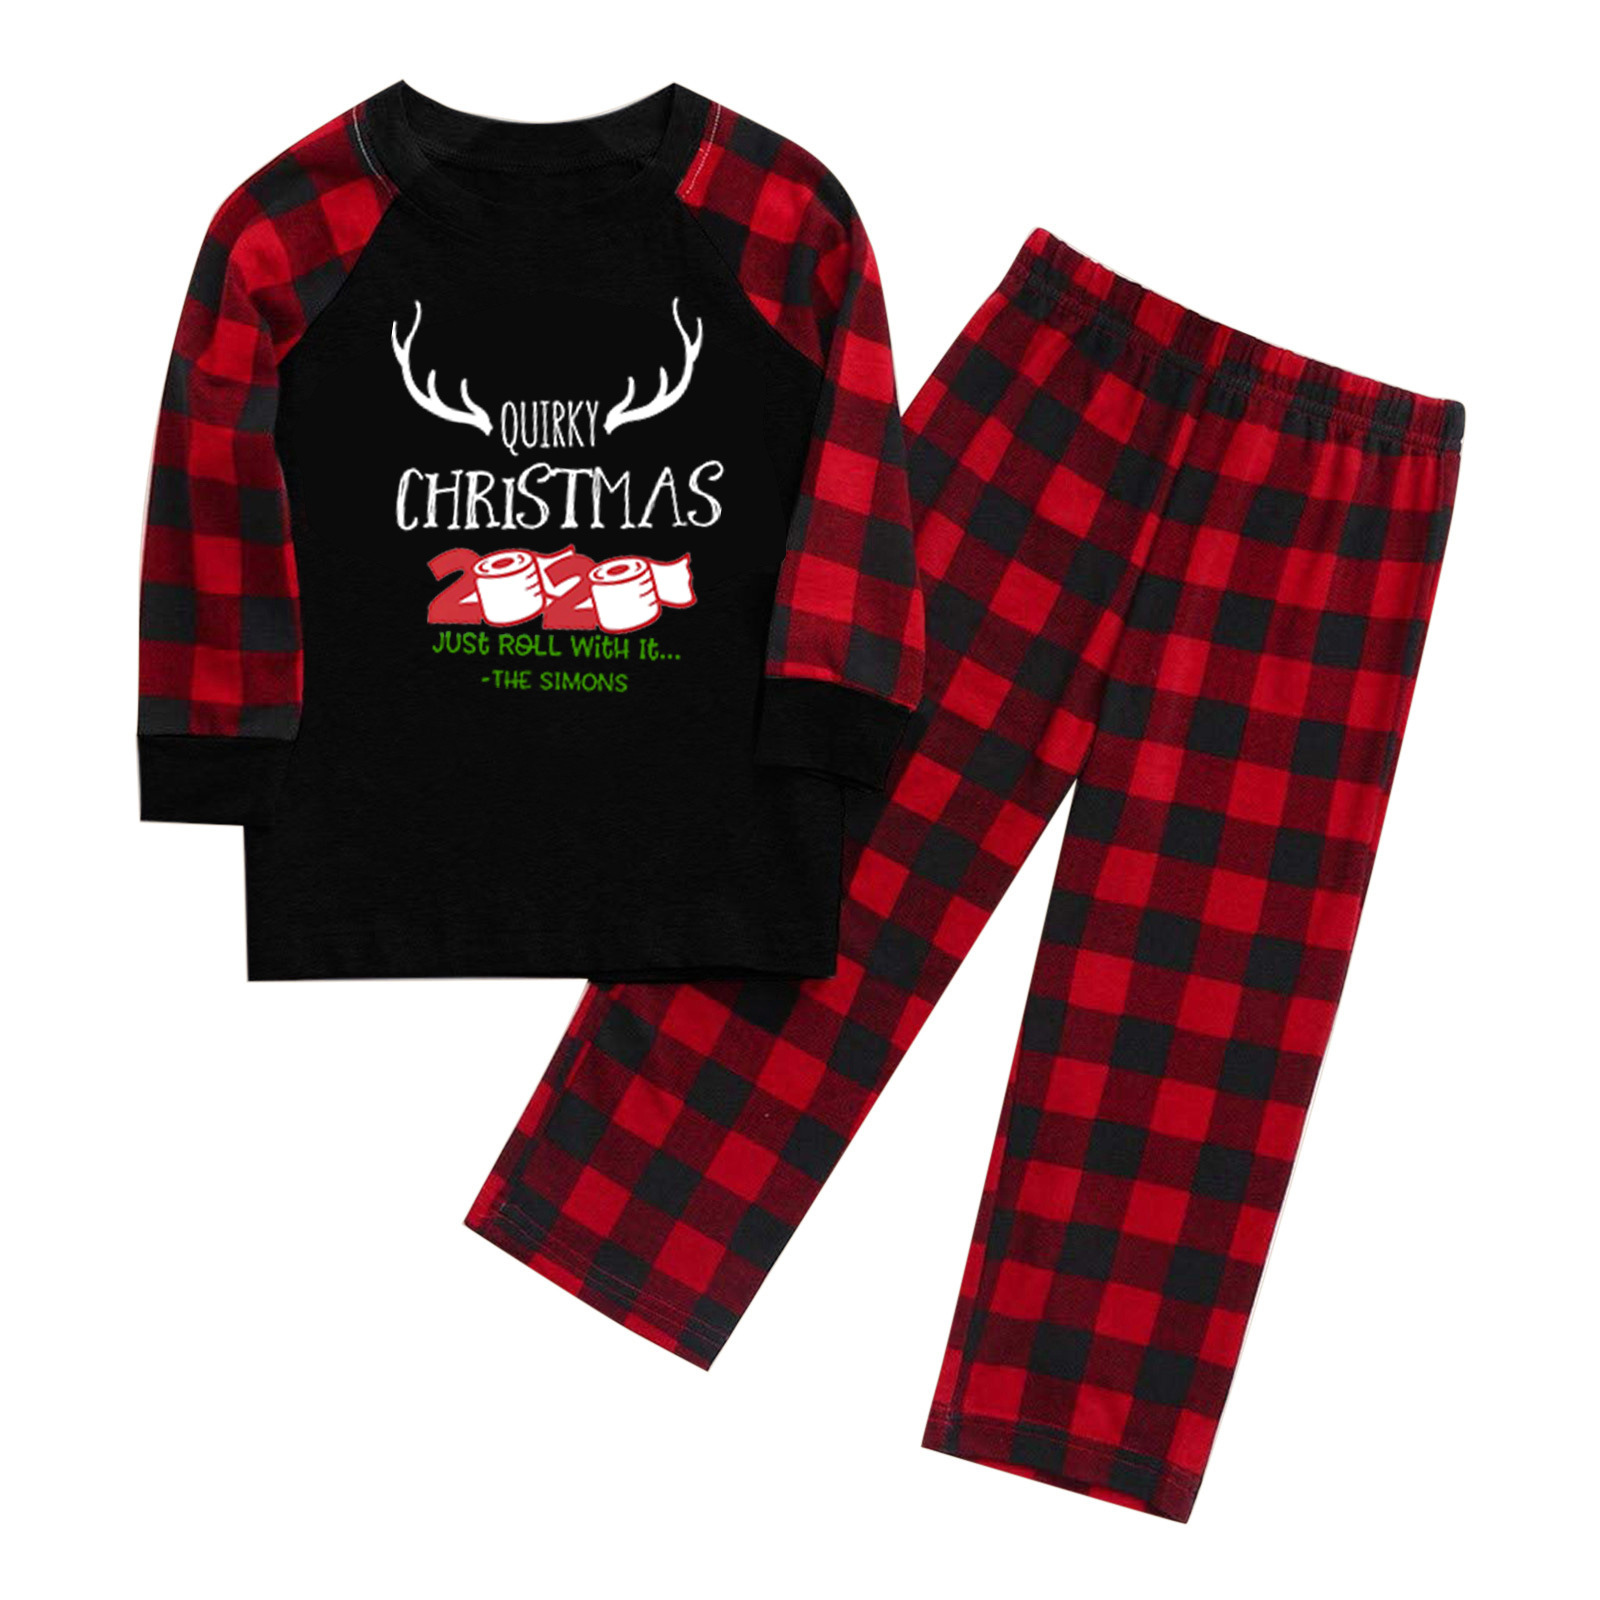 2020 Christmas Pajamas suits for Family